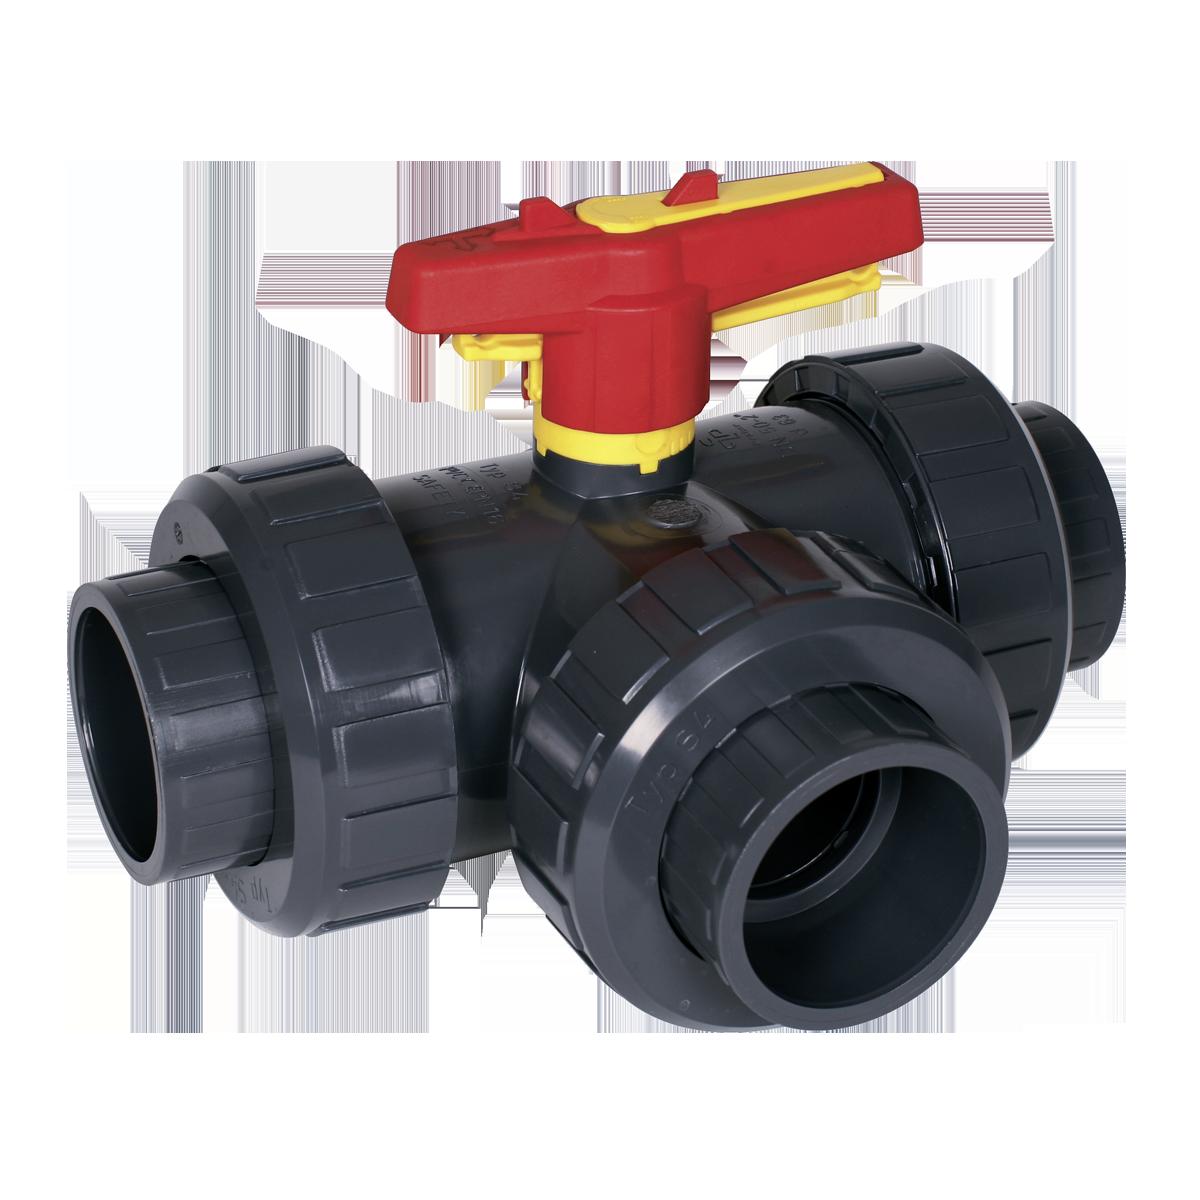 Praher 3-way ball valve S4 PVC, grey, yellow, red